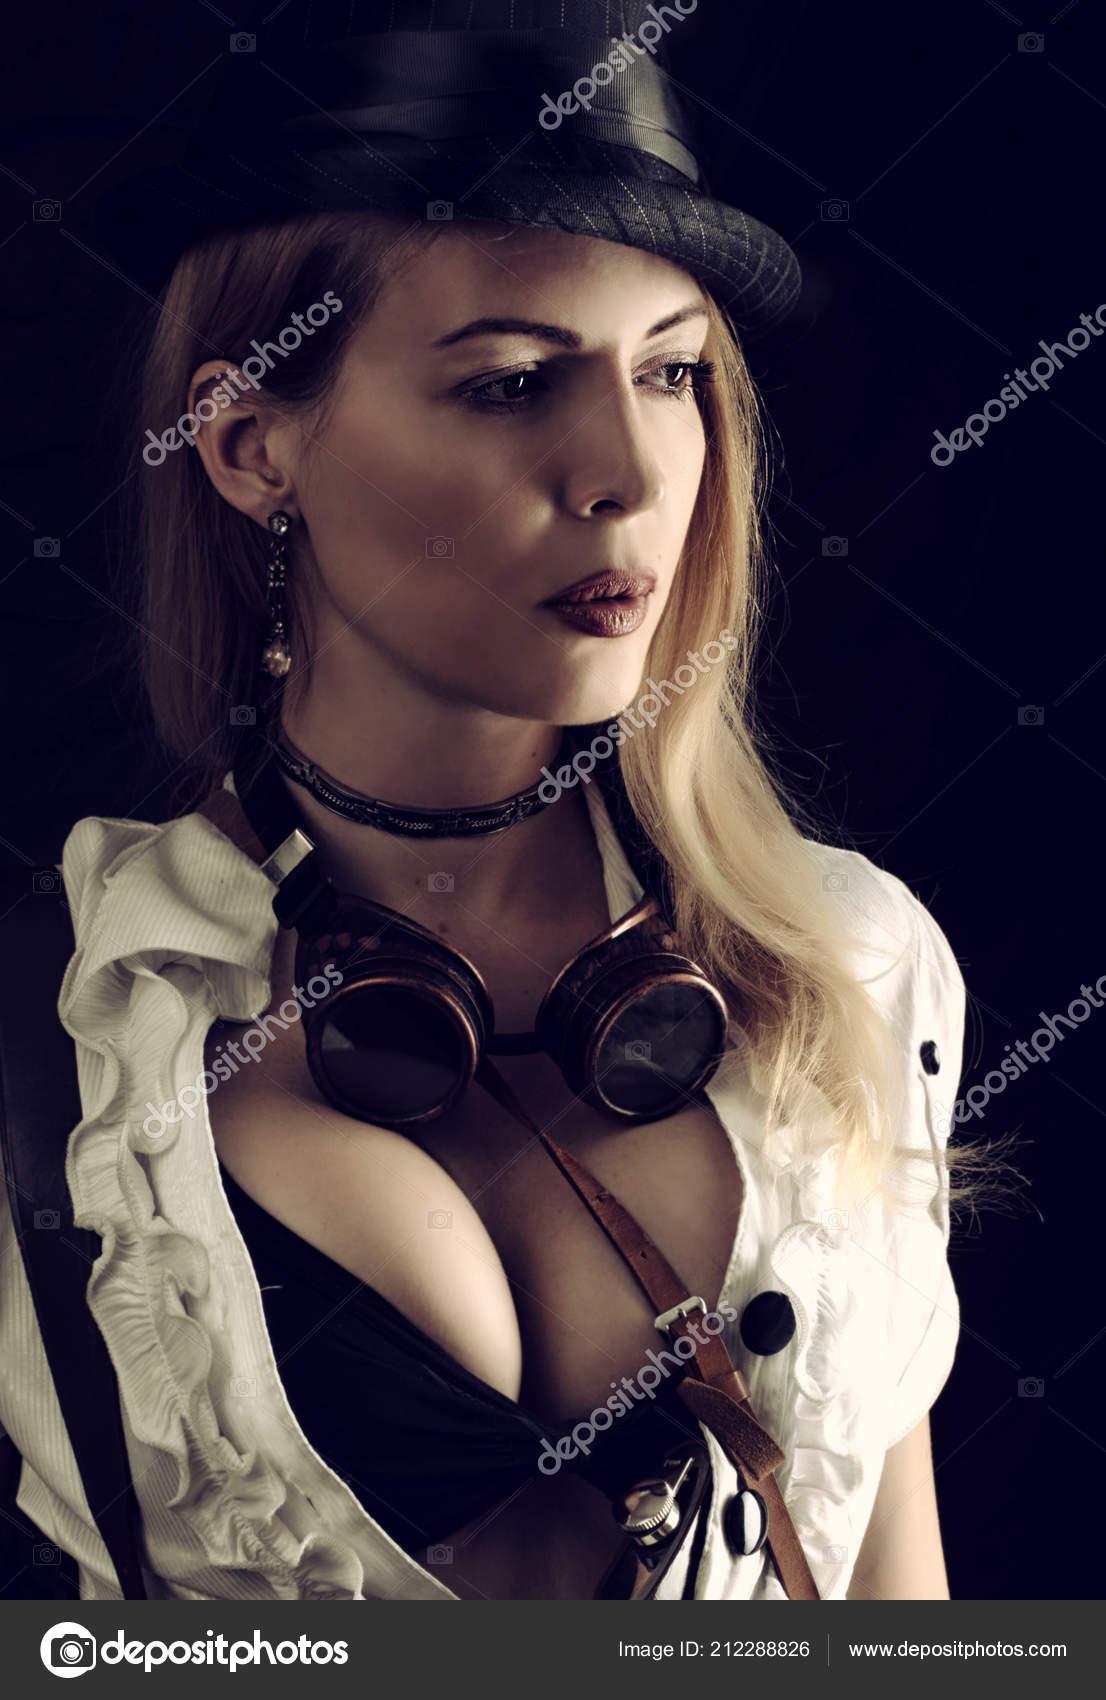 1306ddde31c Σέξι Κορίτσι Φορώντας Κοστούμι Steampunk Μαύρο Φόντο — Φωτογραφία ...